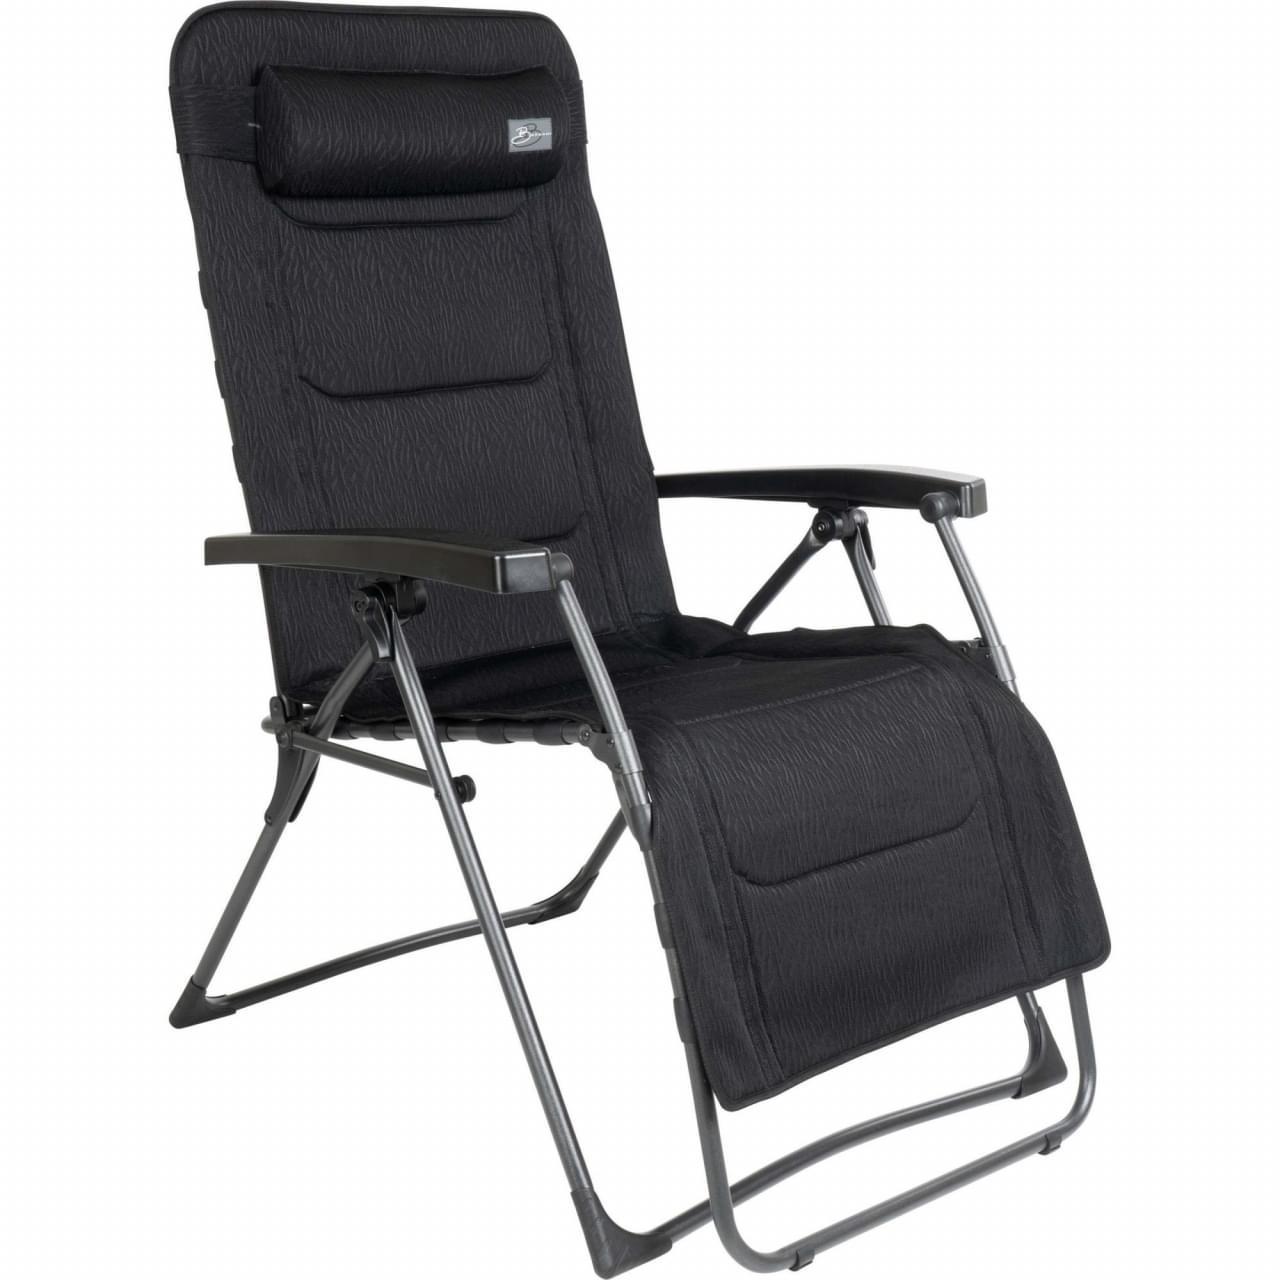 Bardani Riposo Clip 3D Comfort Relaxstoel - Zwart